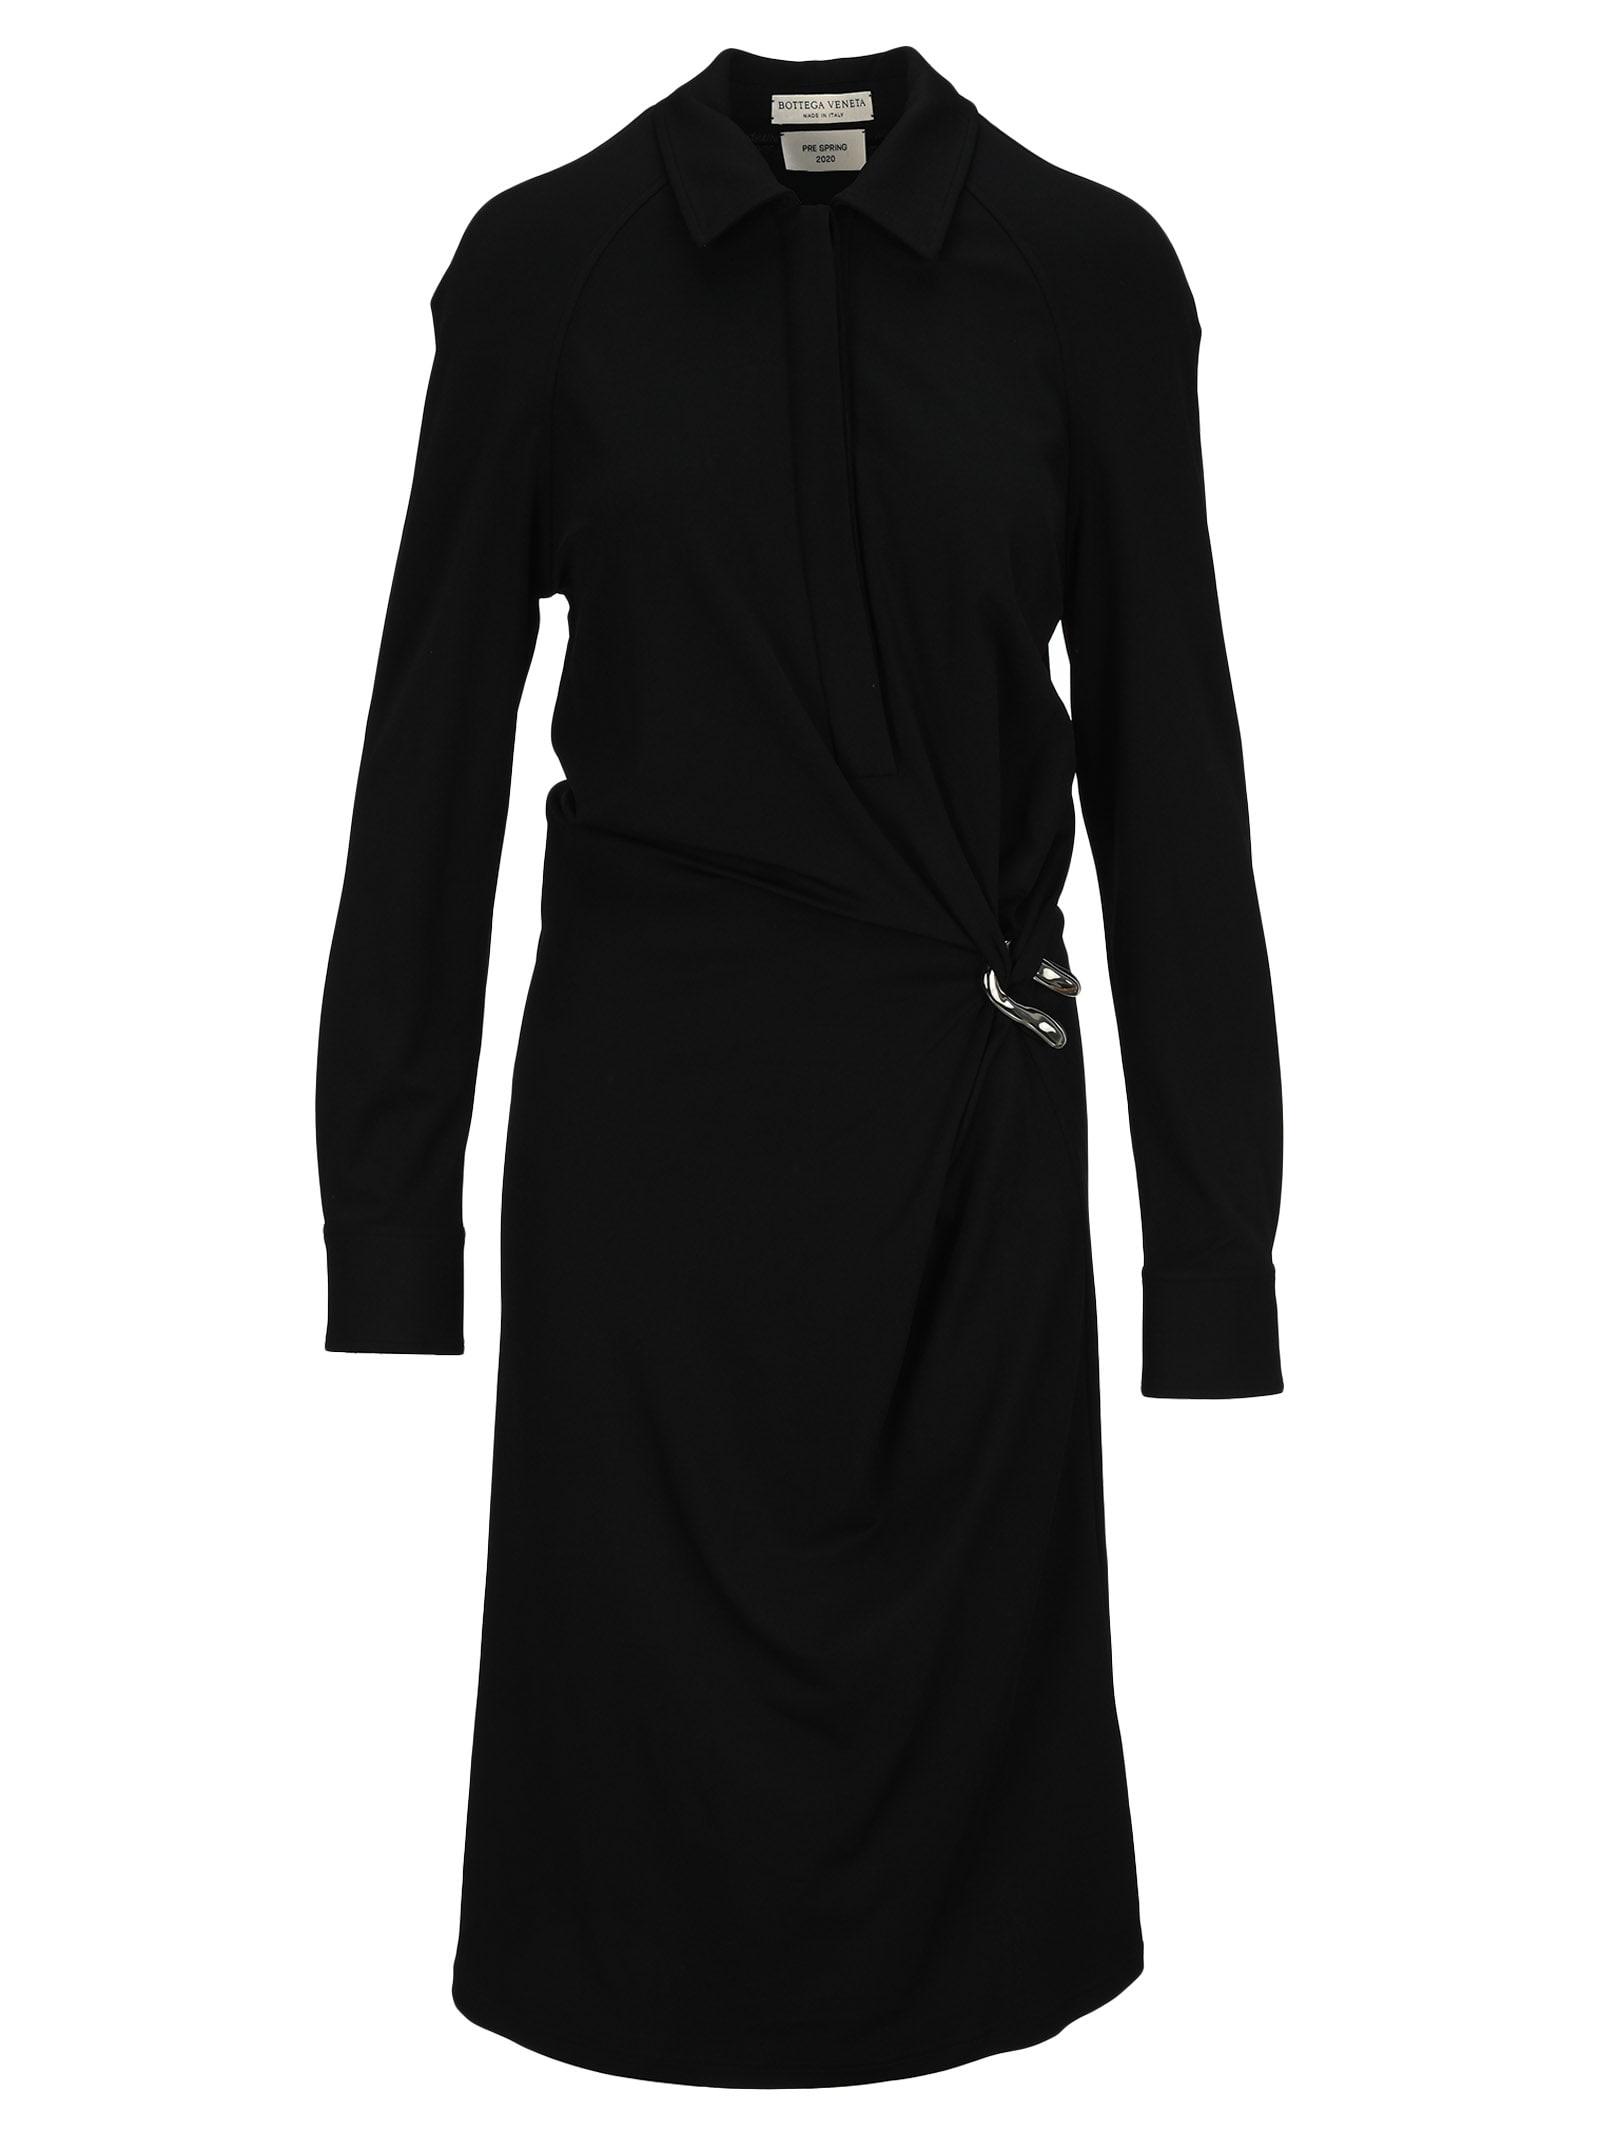 Buy Bottega Veneta Draped Shirtdress online, shop Bottega Veneta with free shipping